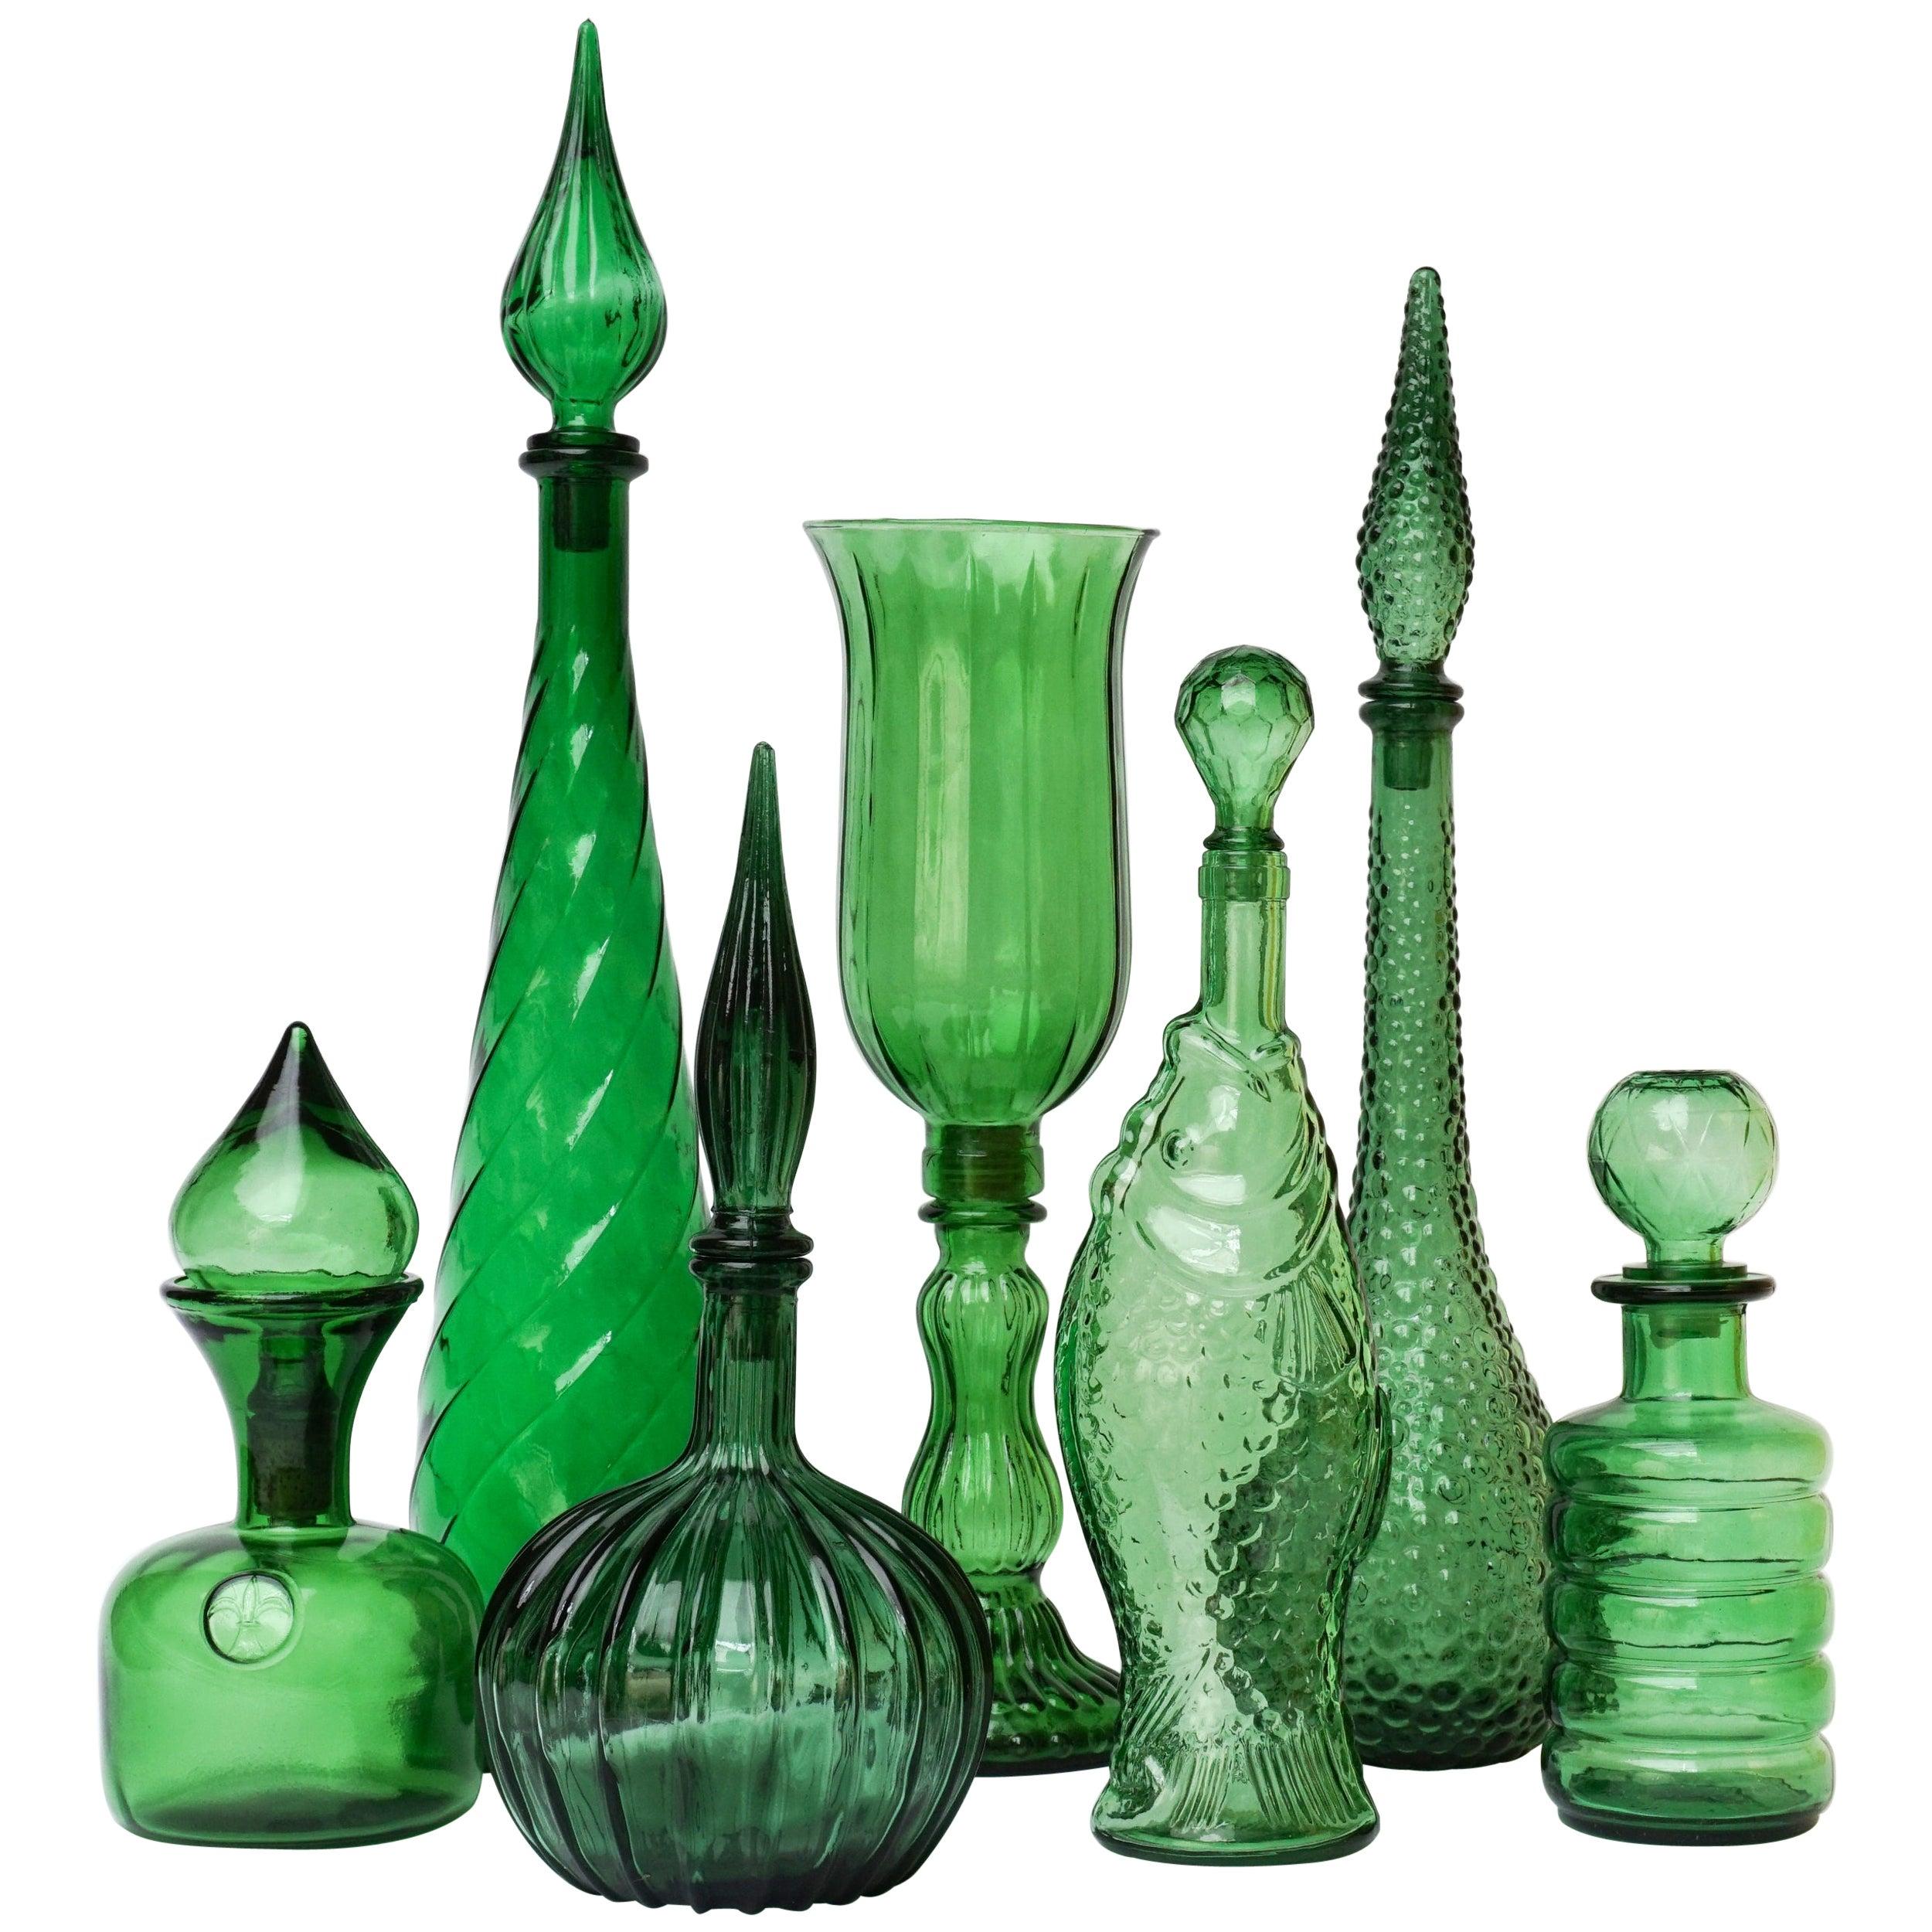 Set of Seven Italian Vintage 1960s Green Glass Empoli 'Genie' Bottles Decanters